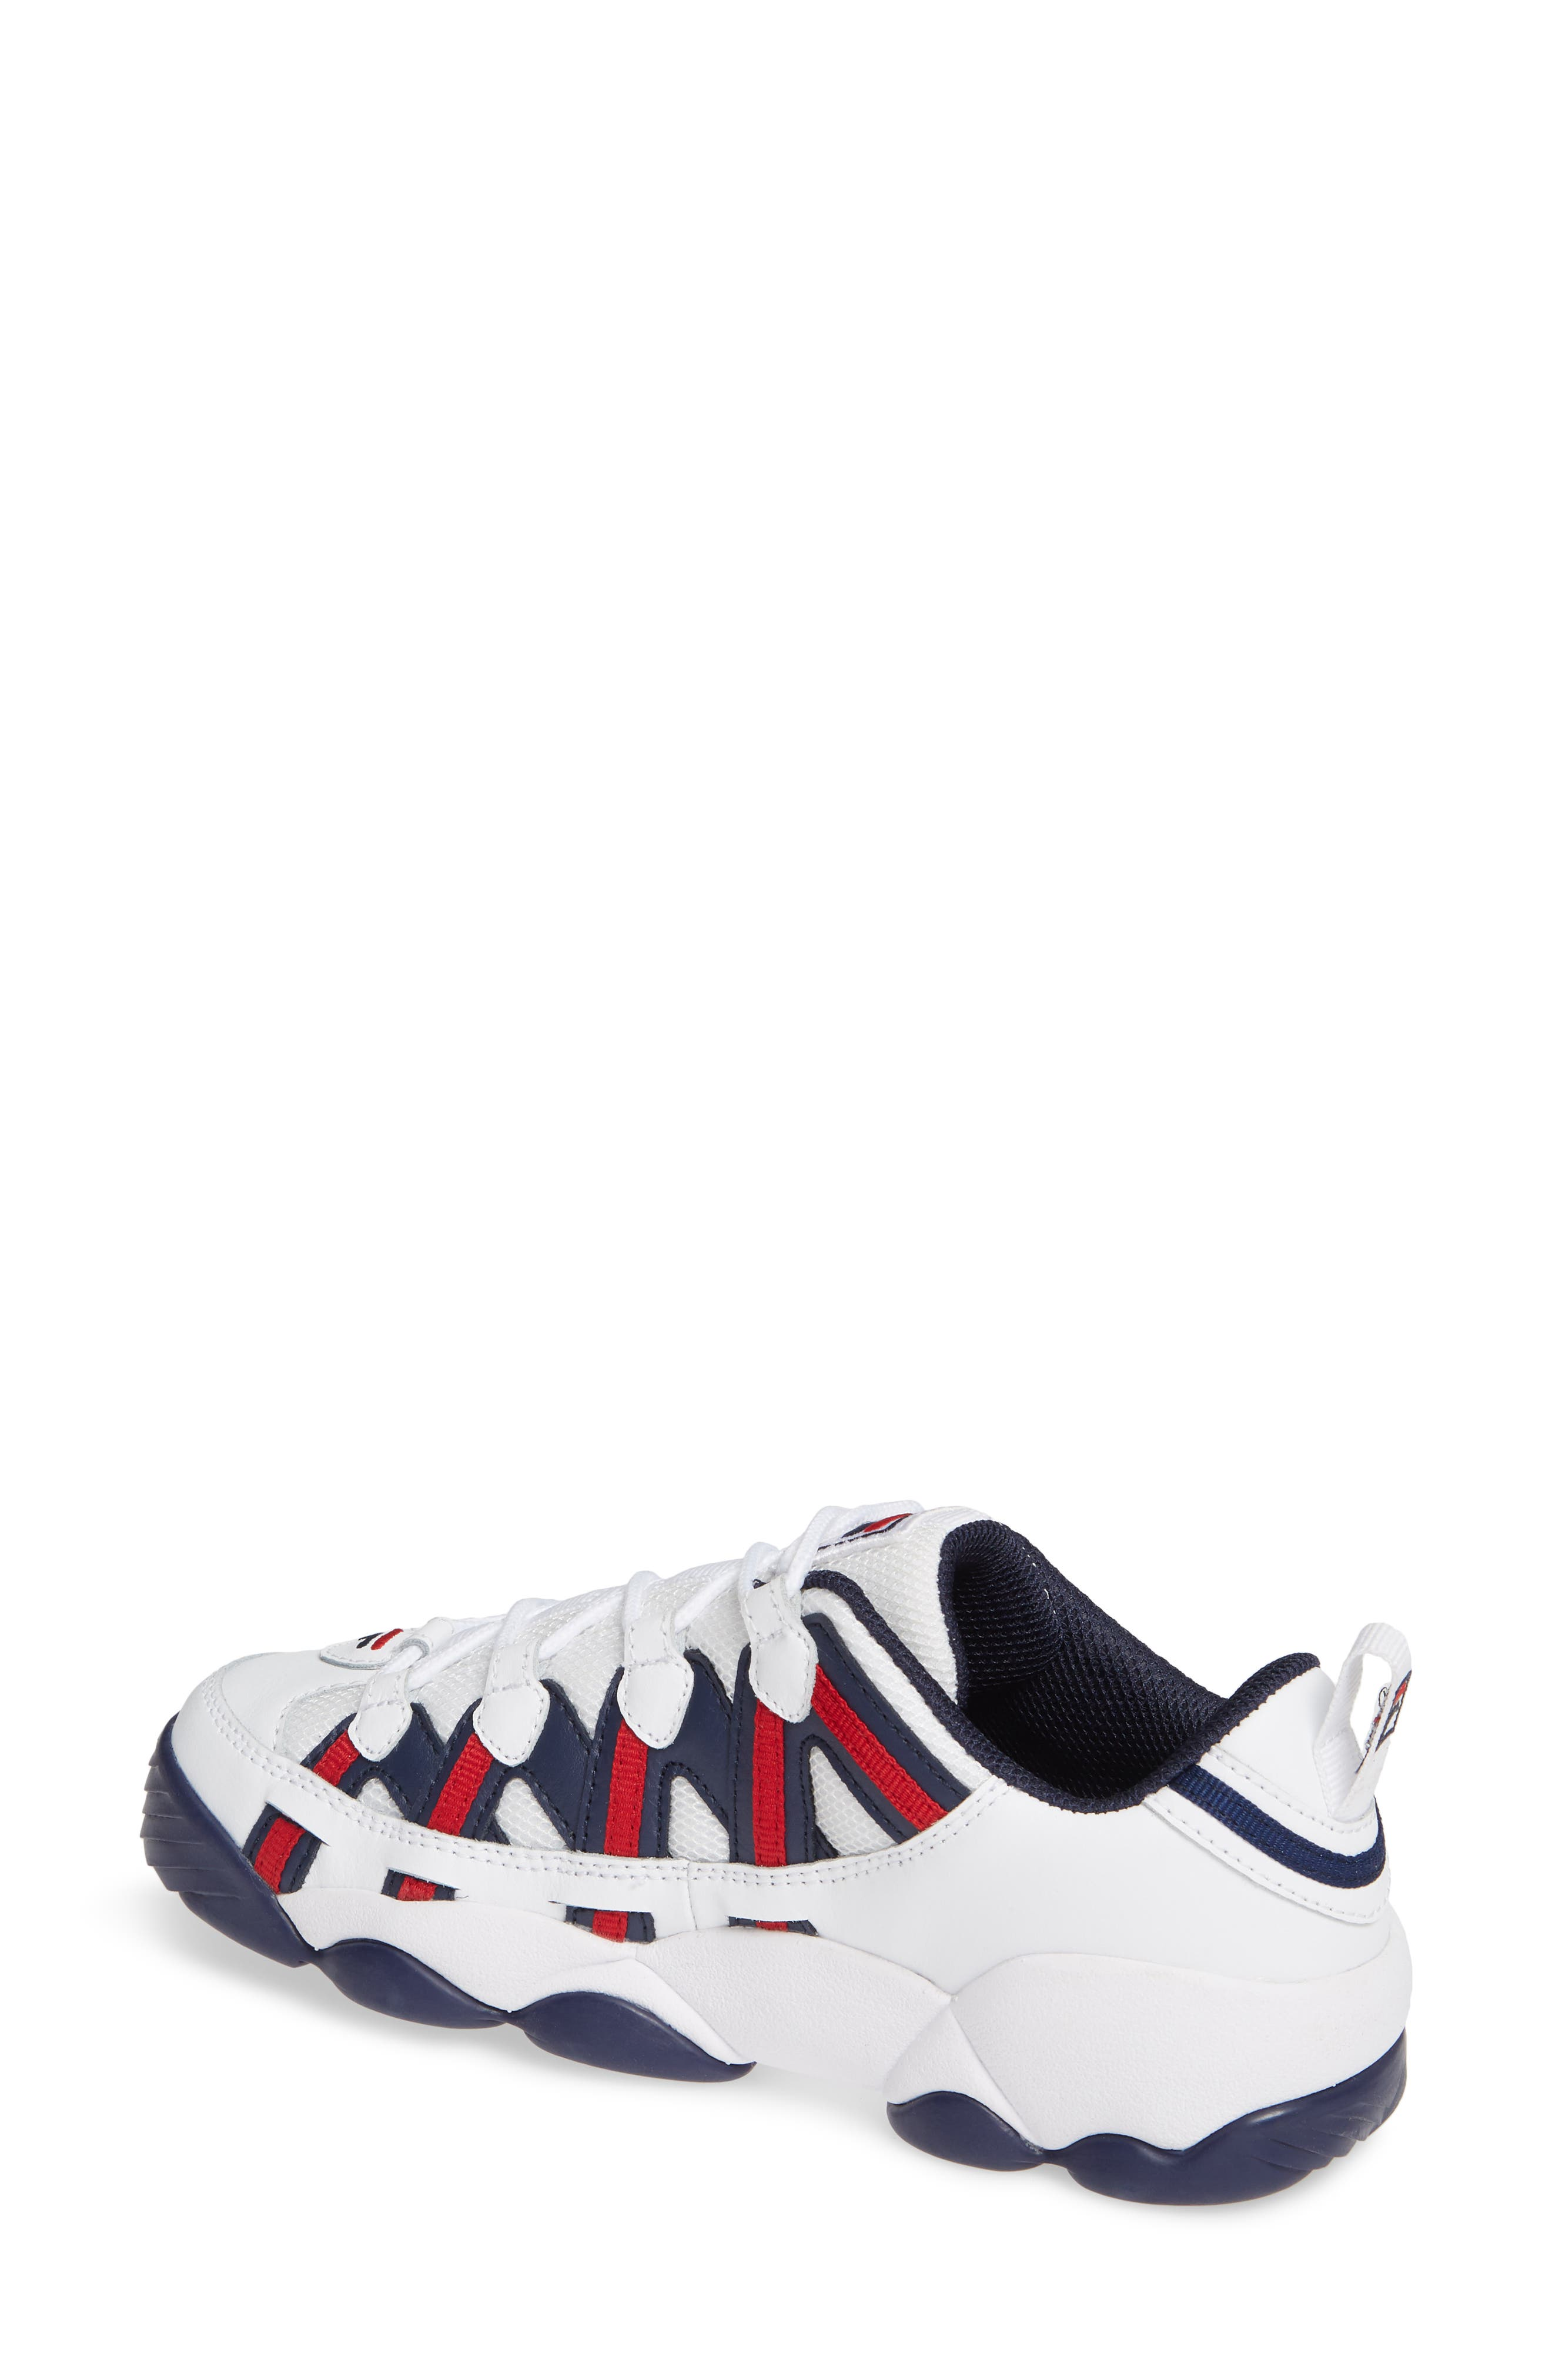 FILA, Spaghetti Low Sneaker, Alternate thumbnail 2, color, WHITE/ FILA NAVY/ FILA RED